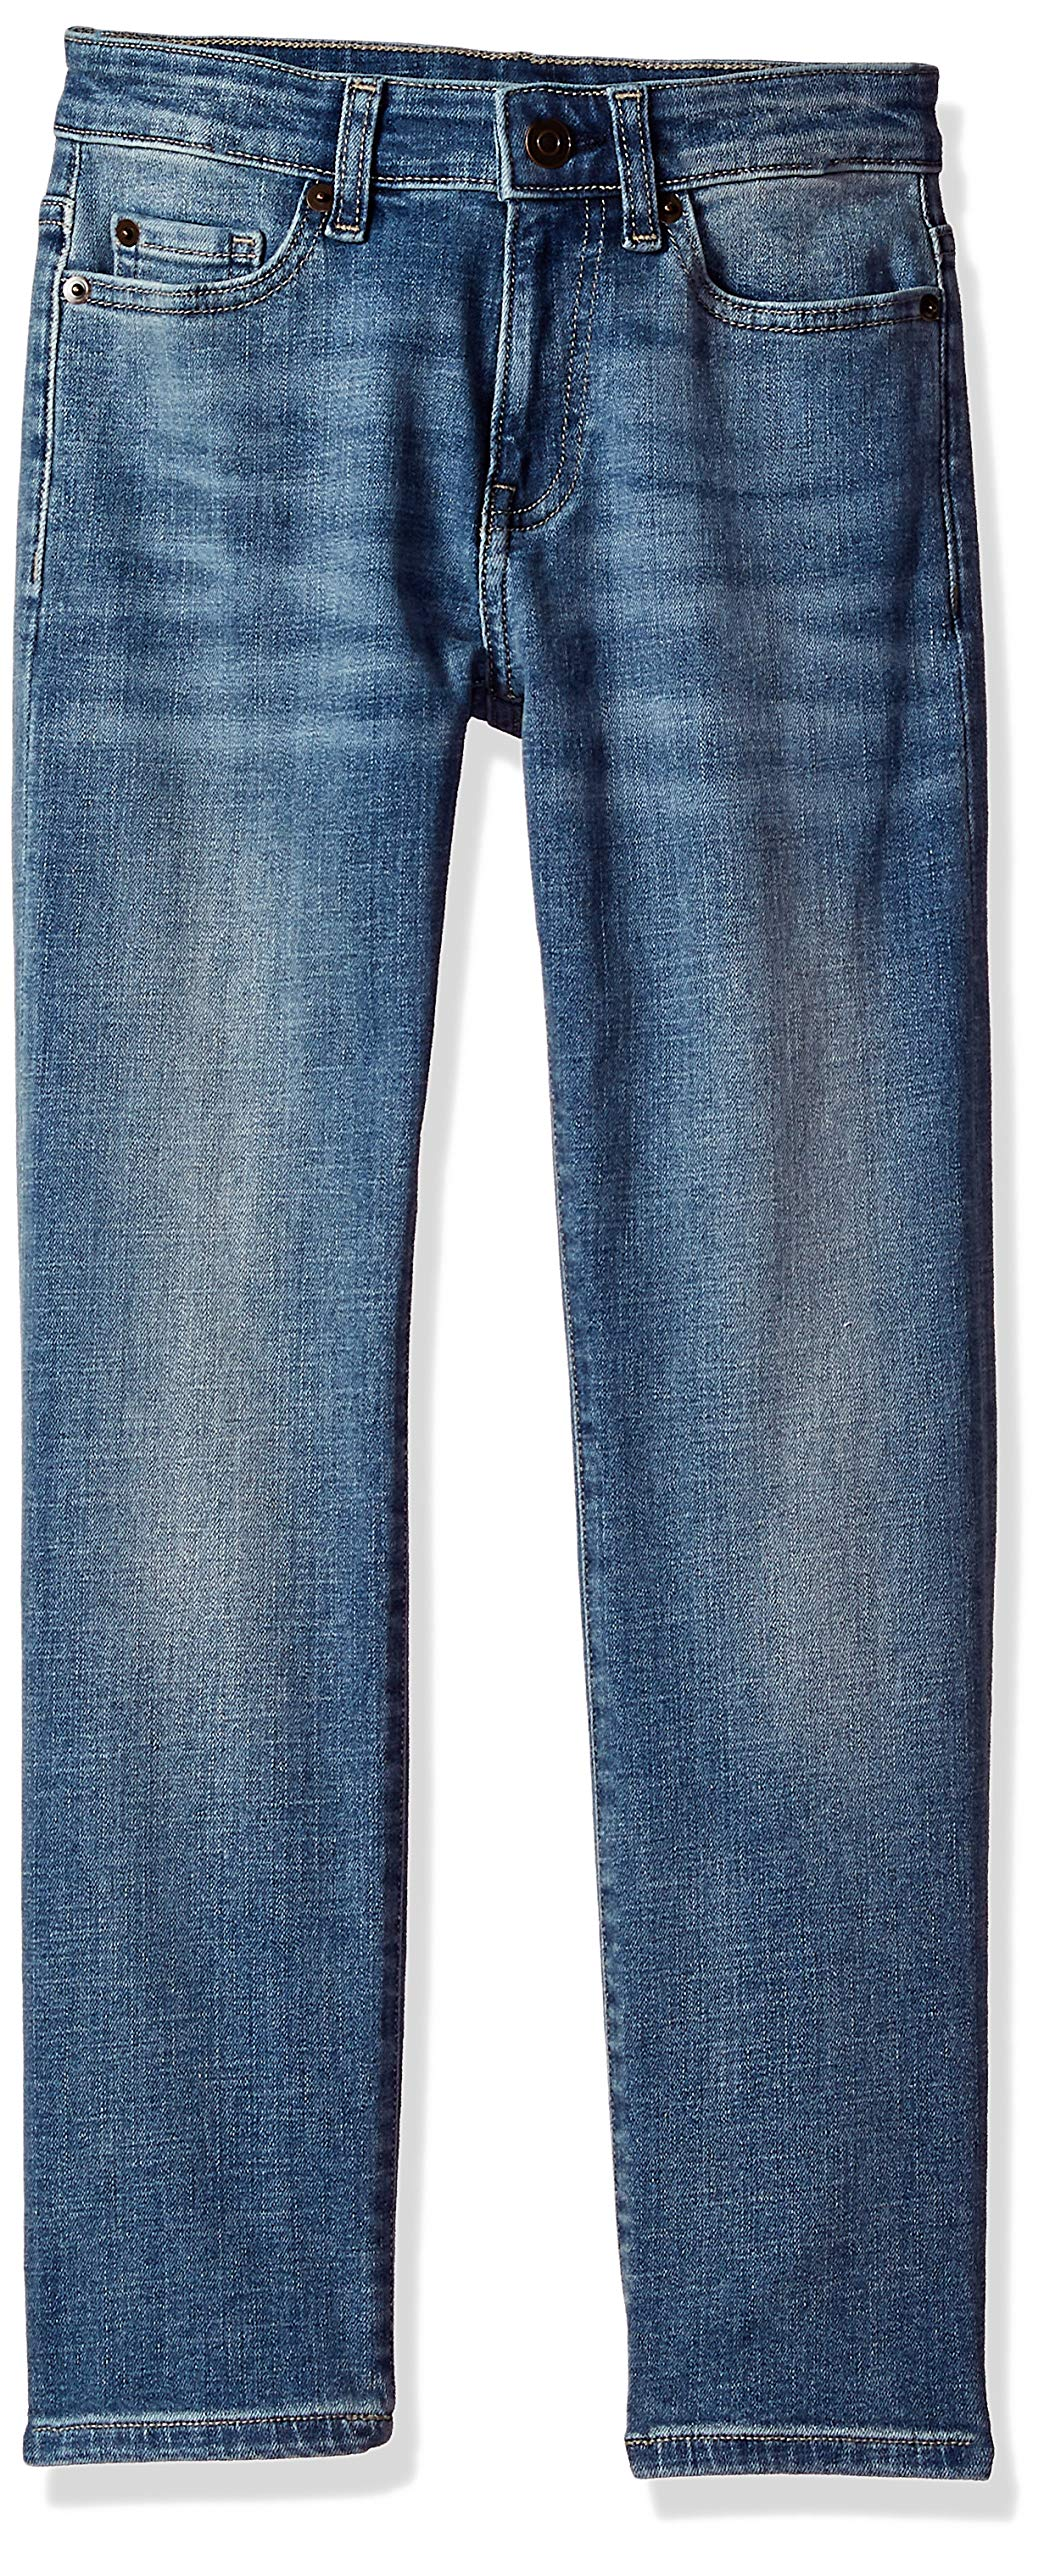 Essentials Boys Straight-fit Stretch Jean